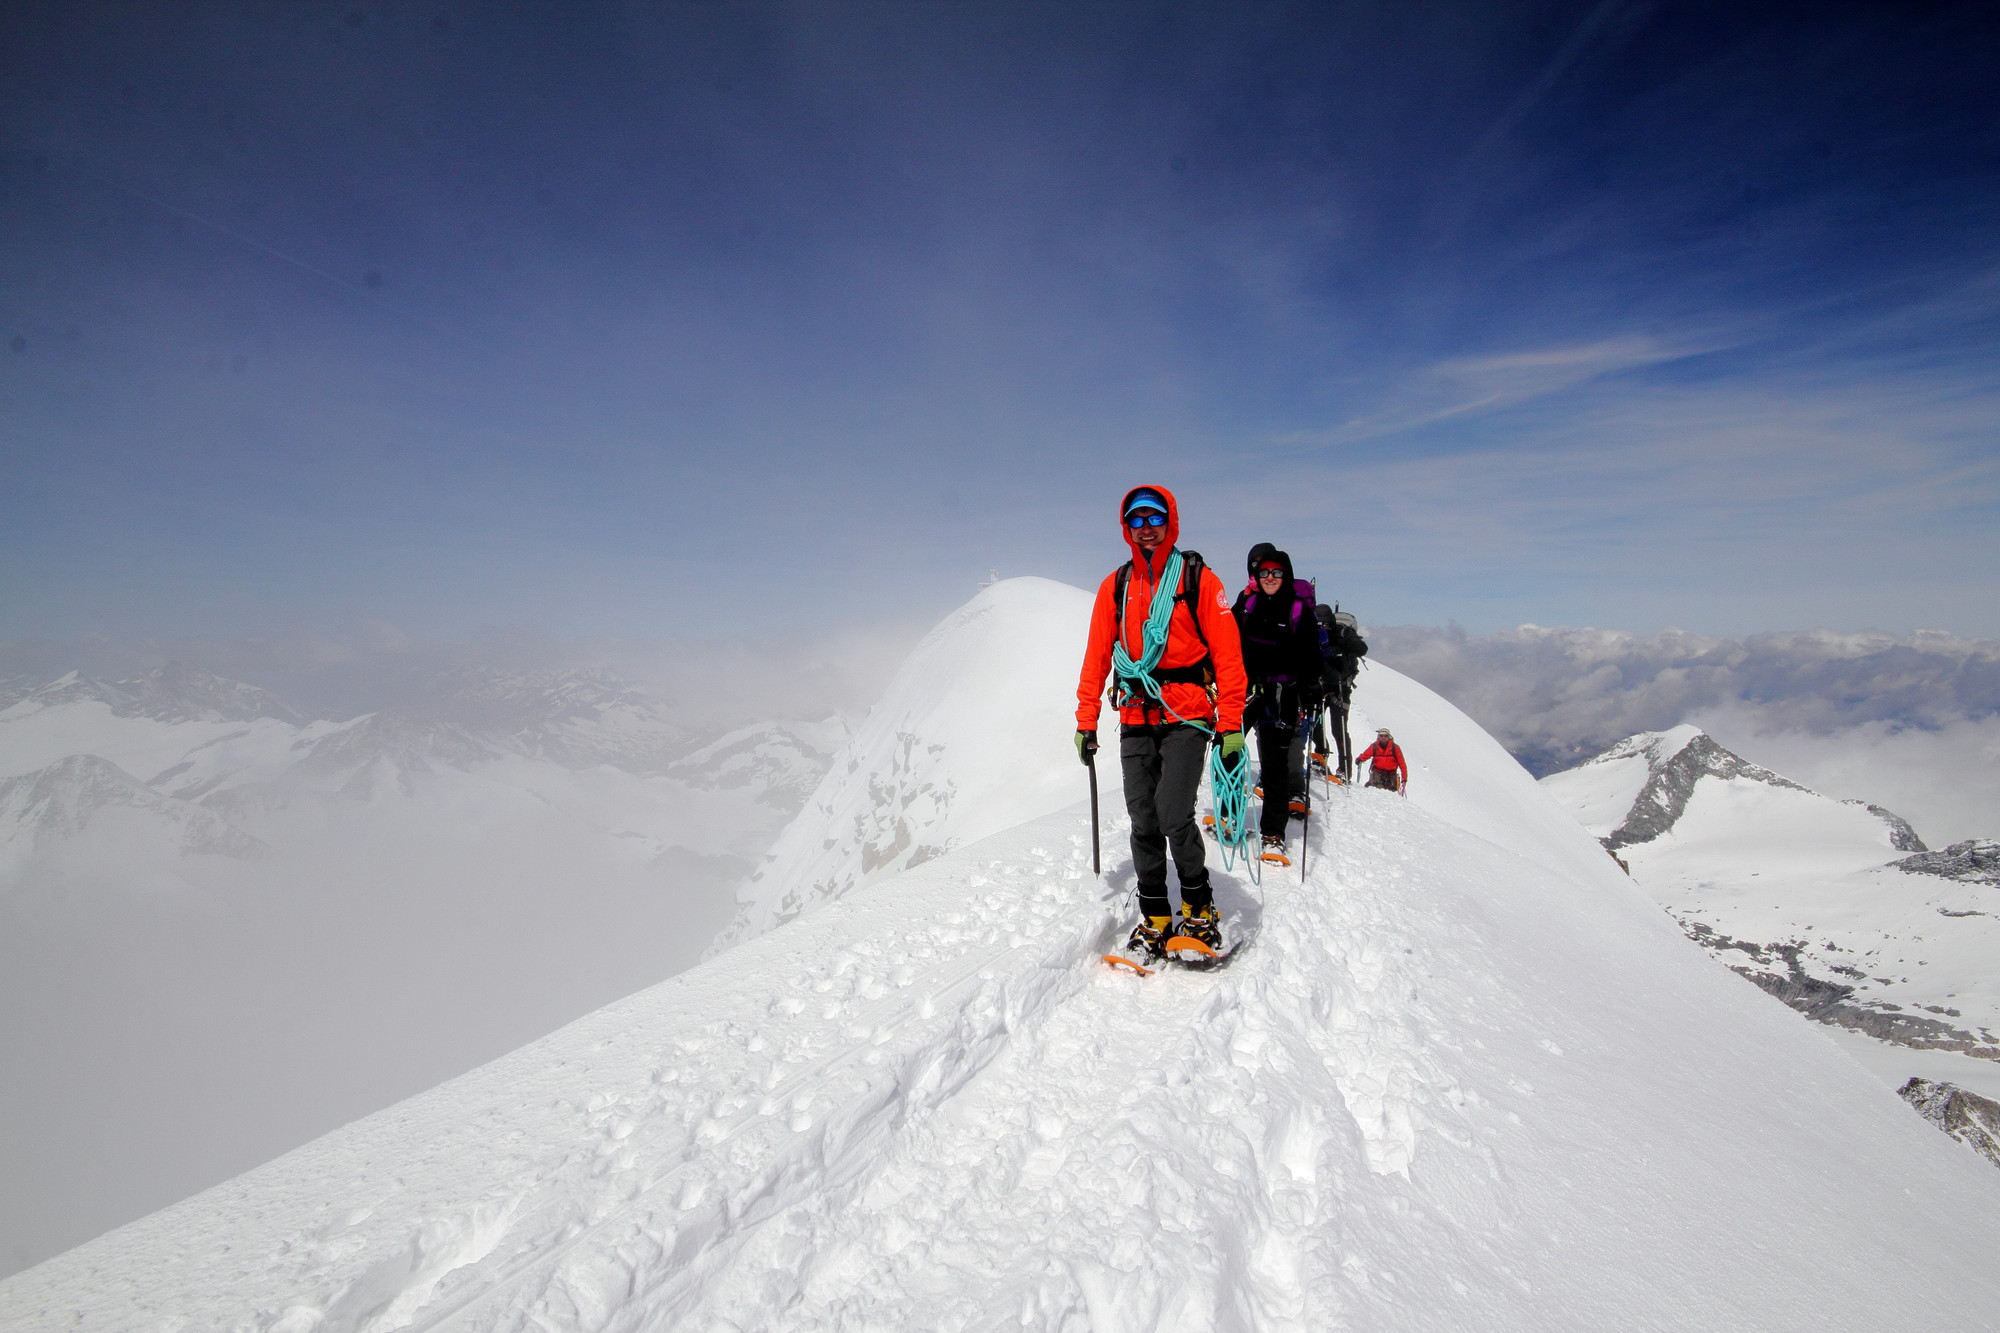 Schneeschuhwanderer gehen hintereinander einen Bergrücken entlang.